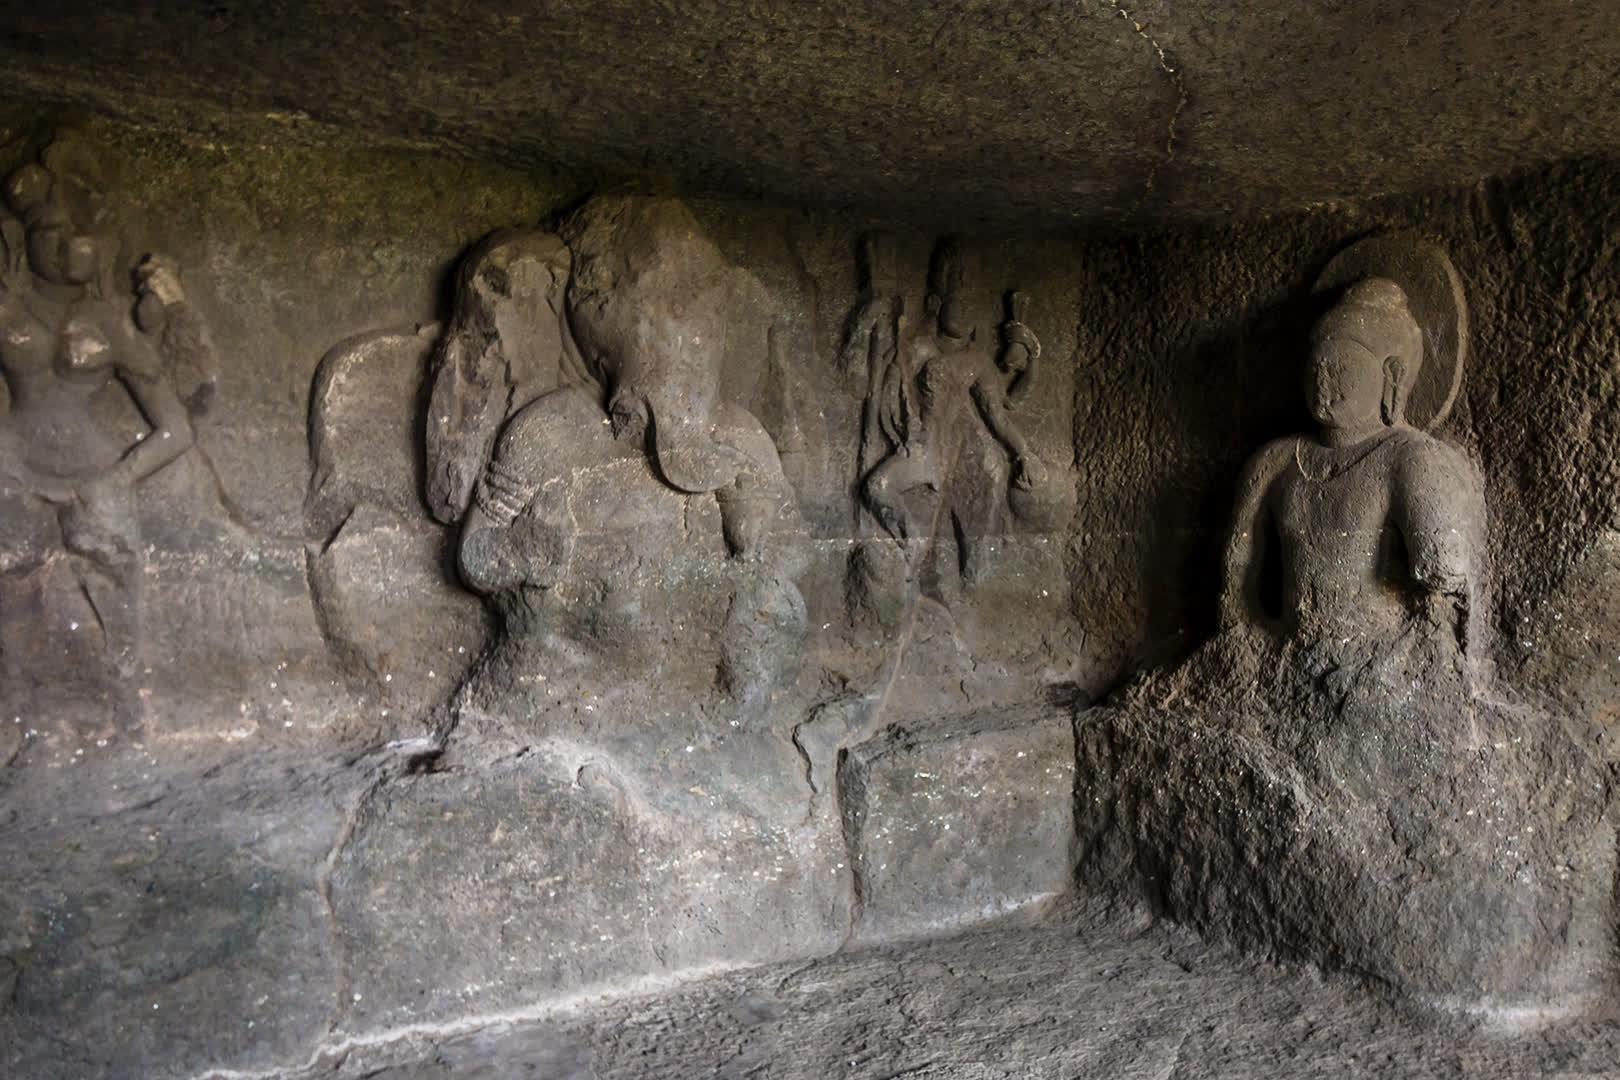 Sculptures of Ganesha and Buddha